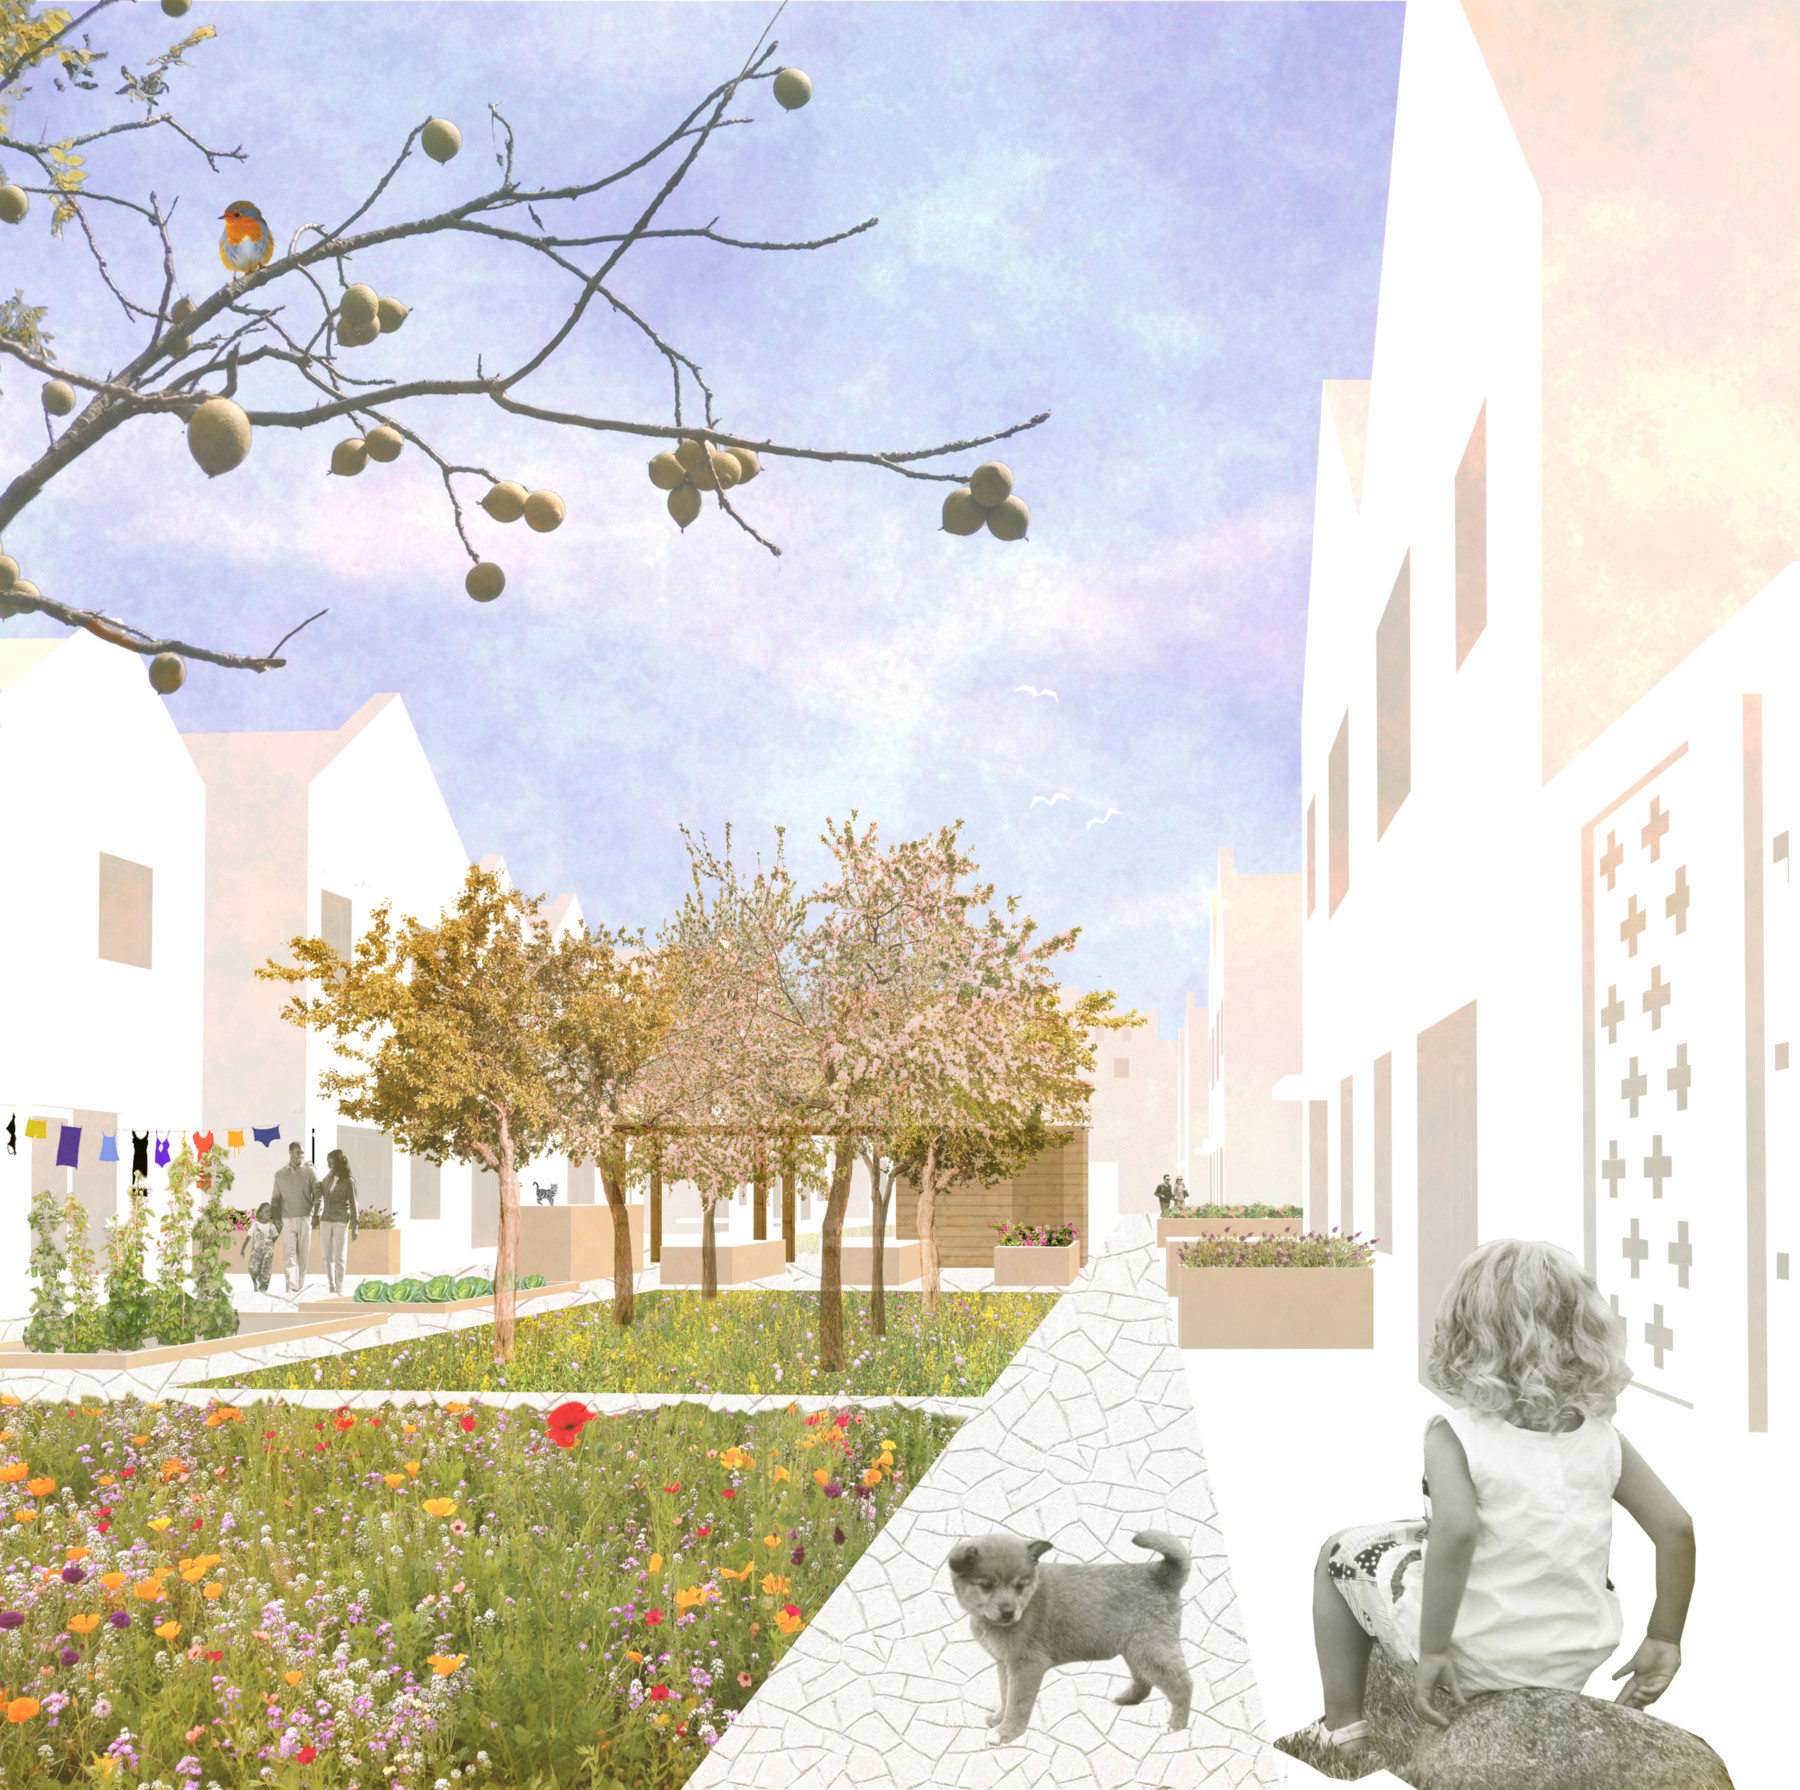 Sarah-Wigglesworth-Architects NWC courtyard-view 3600